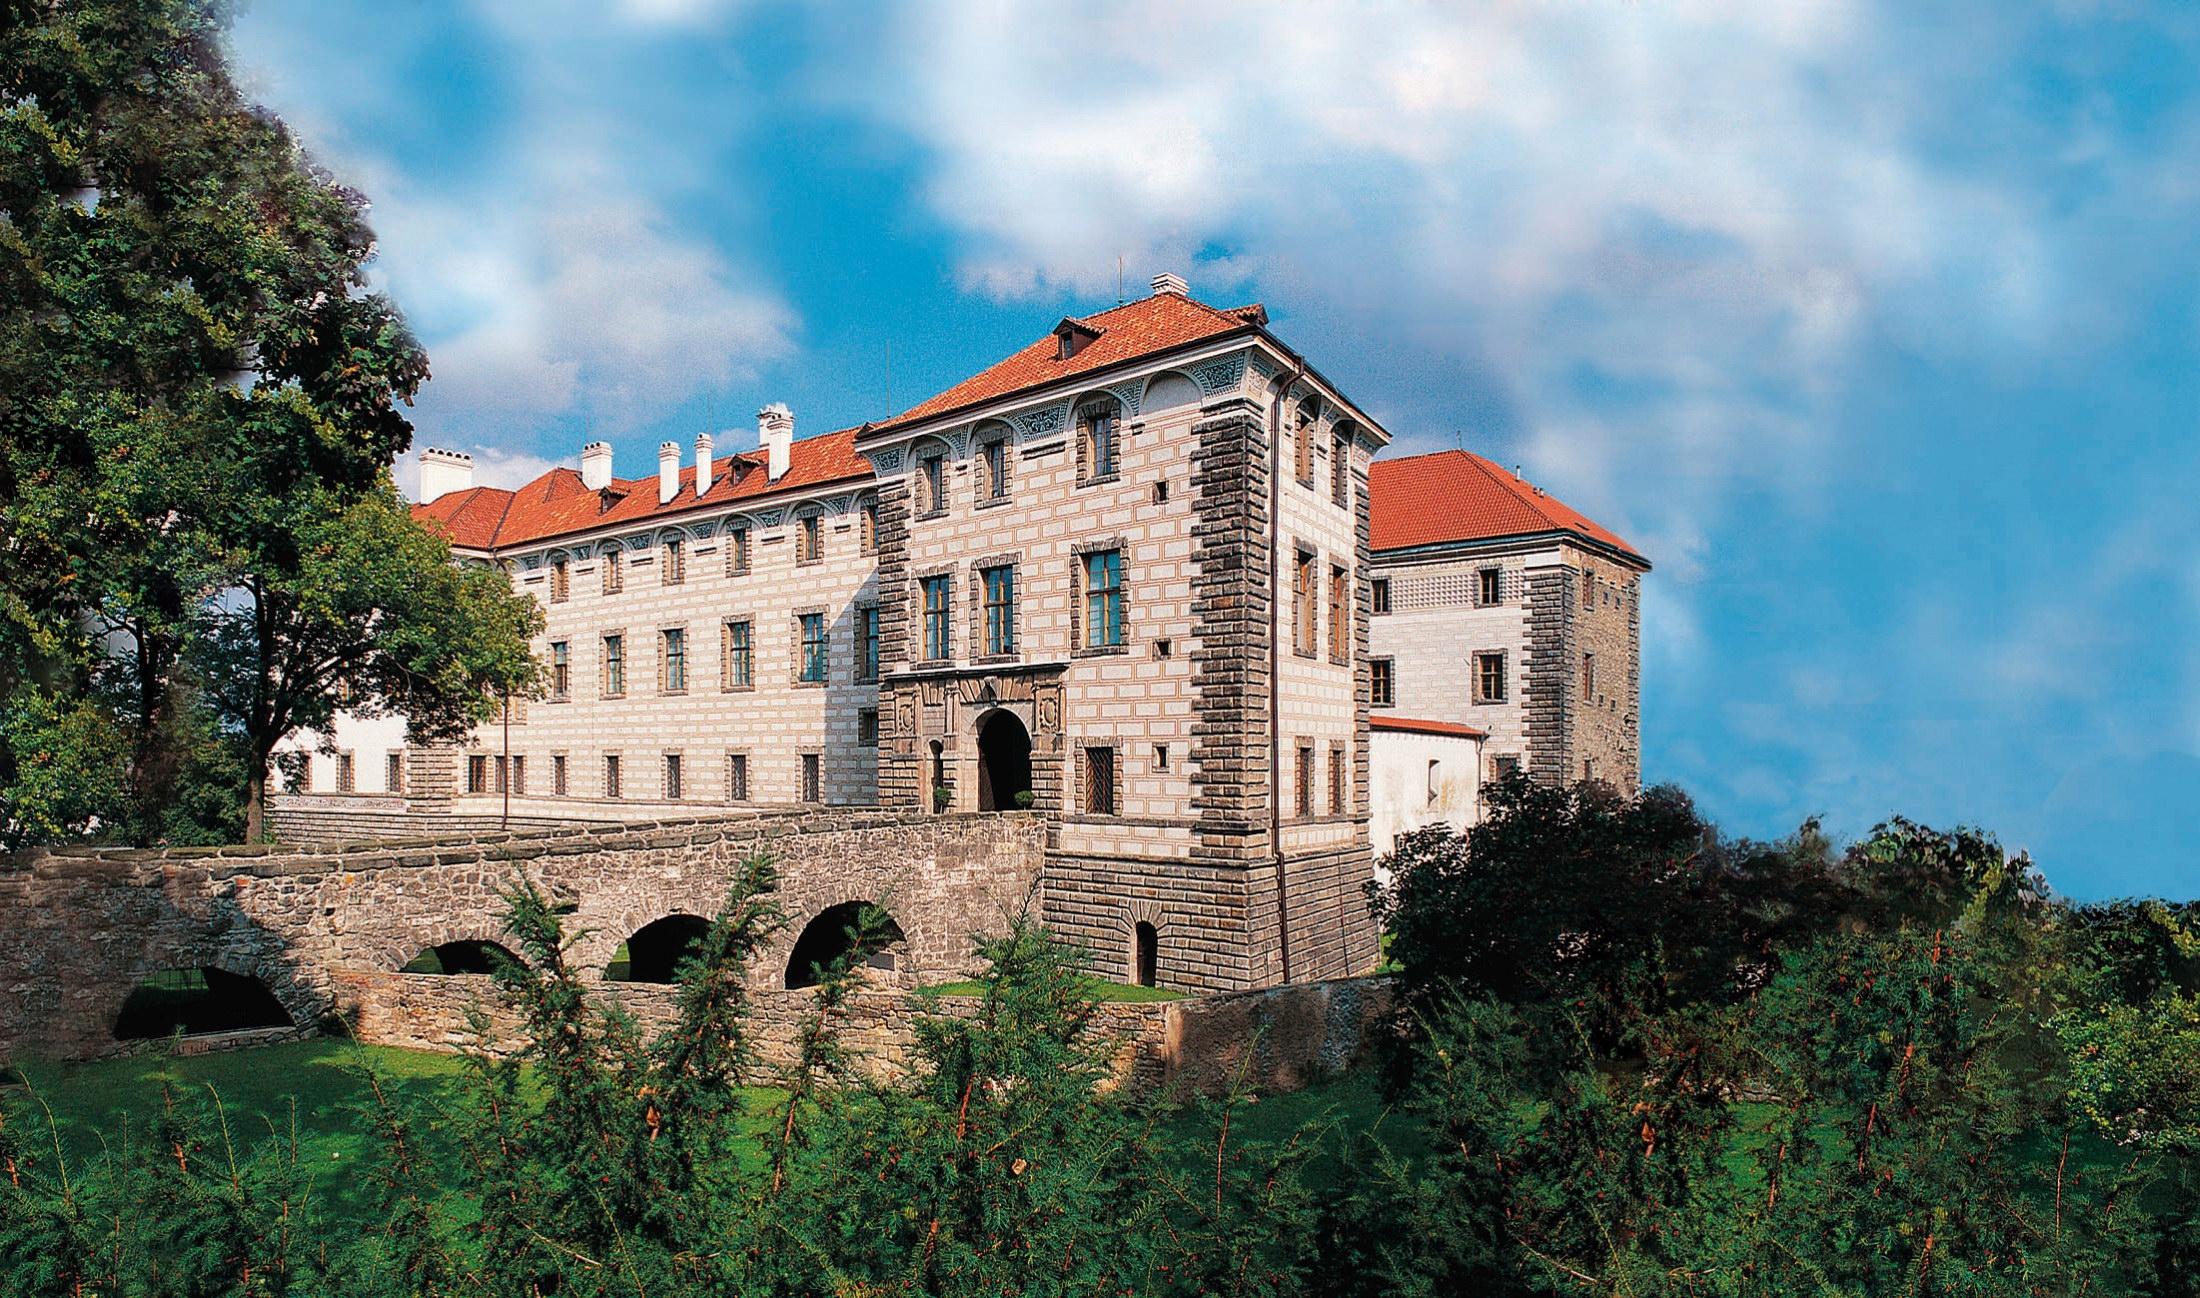 Замок Нелагозевес (Nelahozeves)